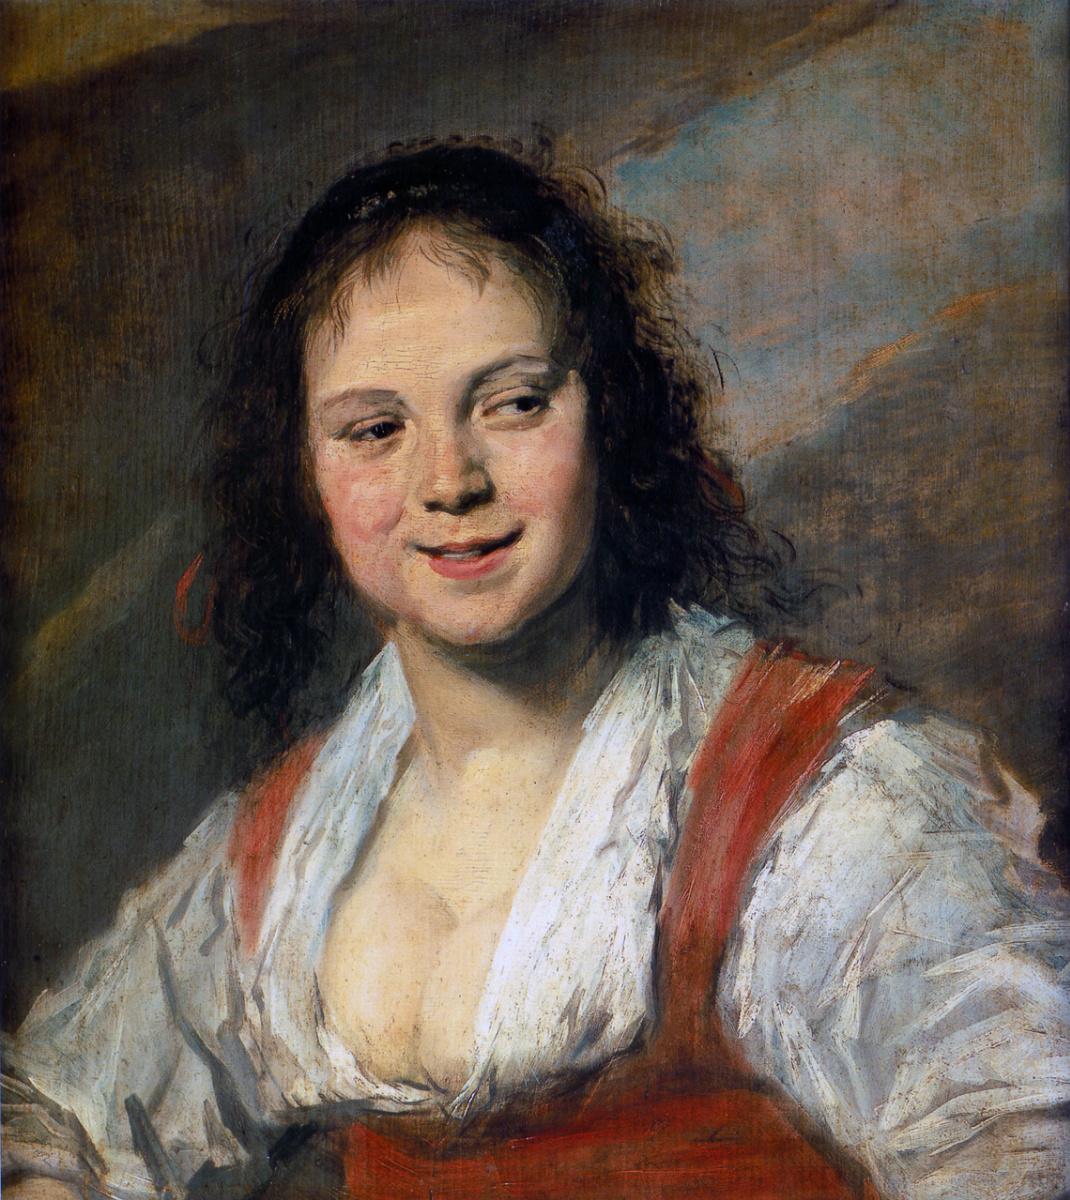 France Hals. The Gypsy Girl